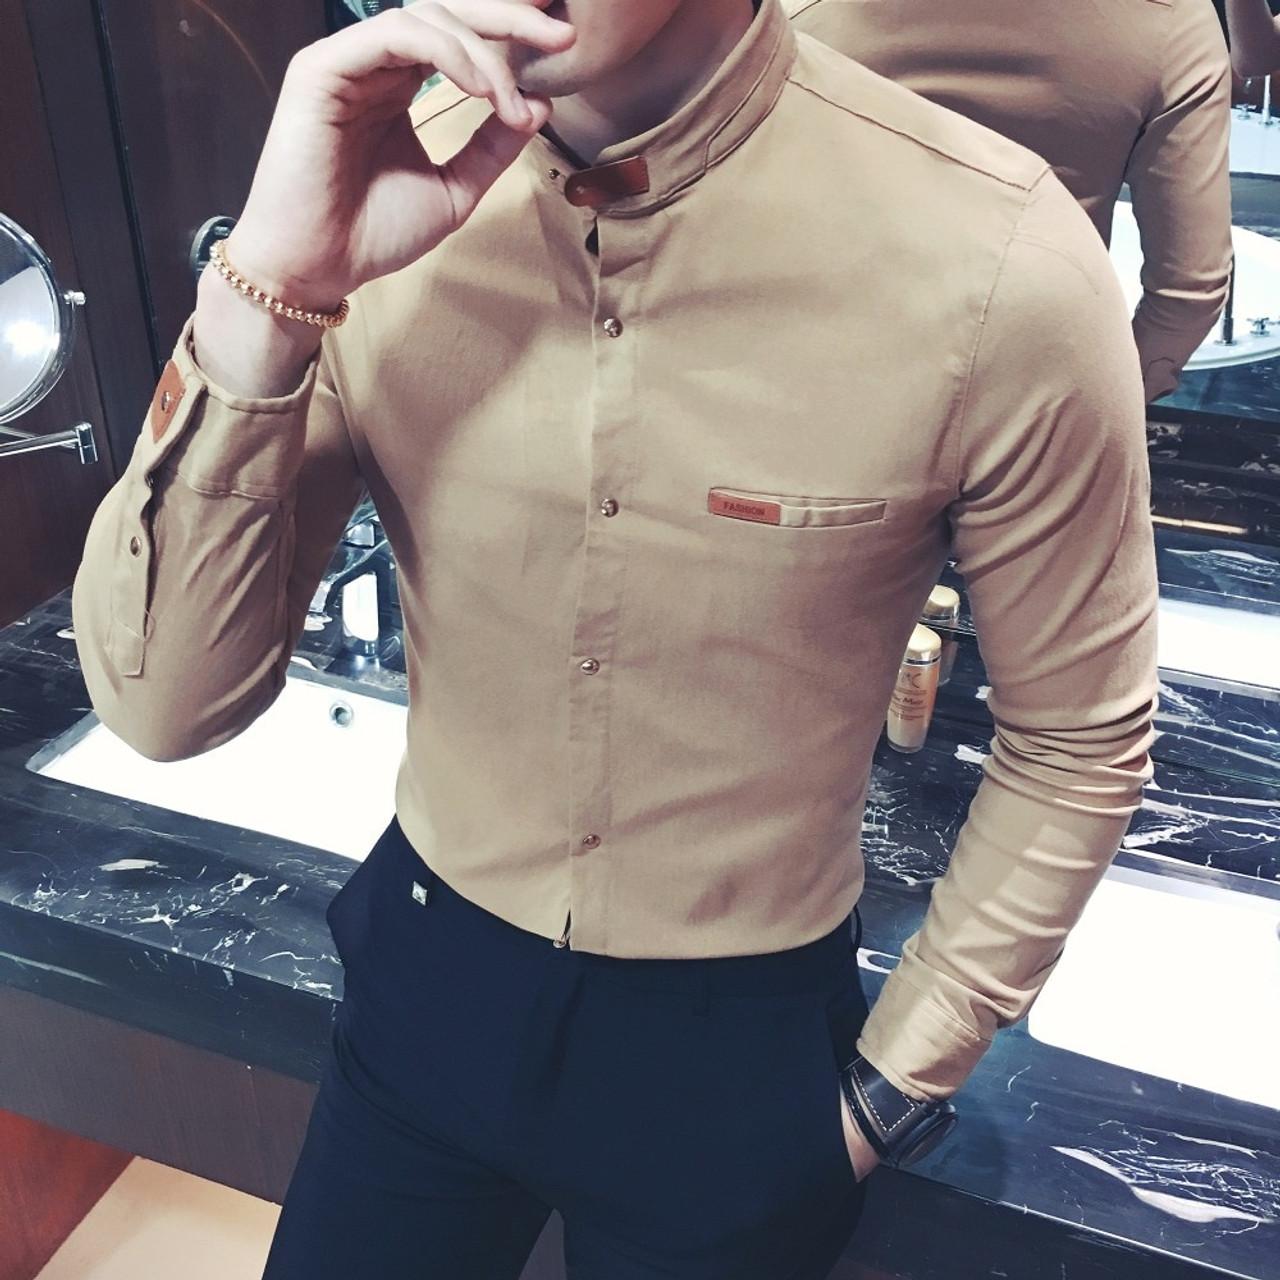 Jcchenfs 2018 New Fashion Brand Men Business Long Sleeved Shirt